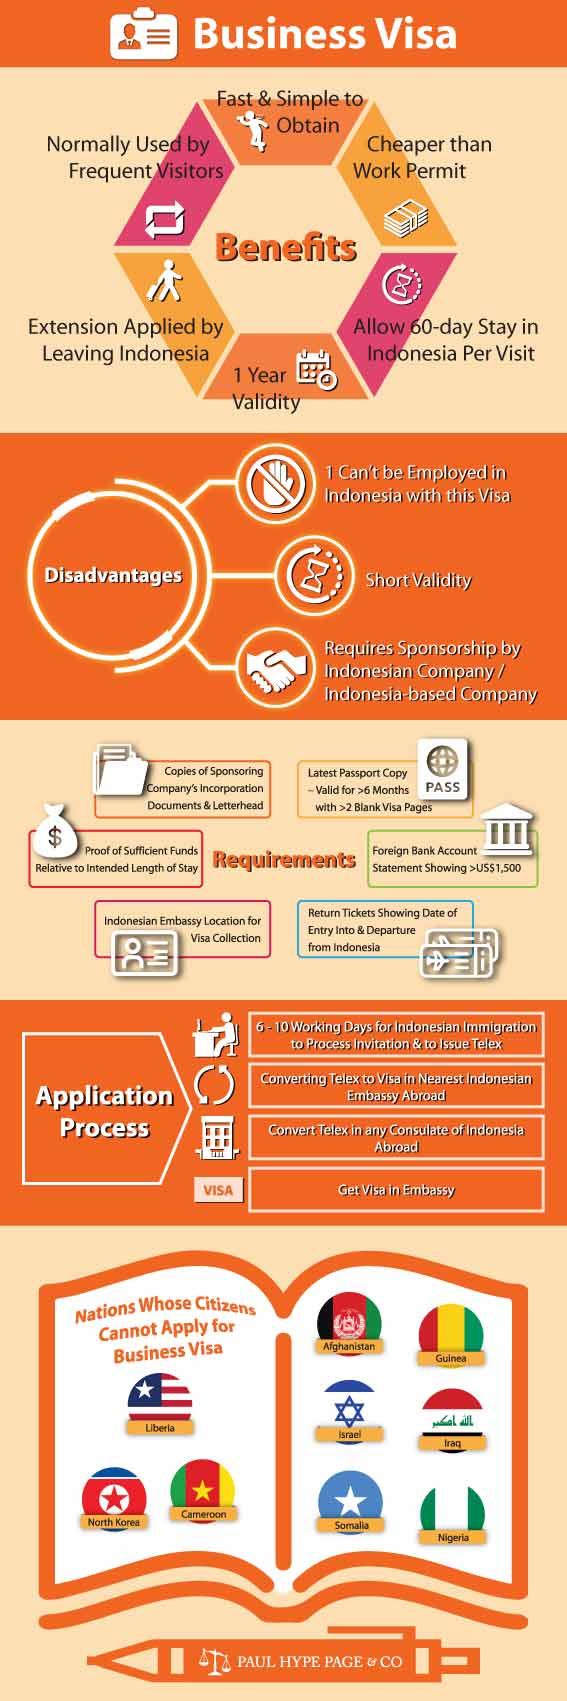 Business Visa Infographic